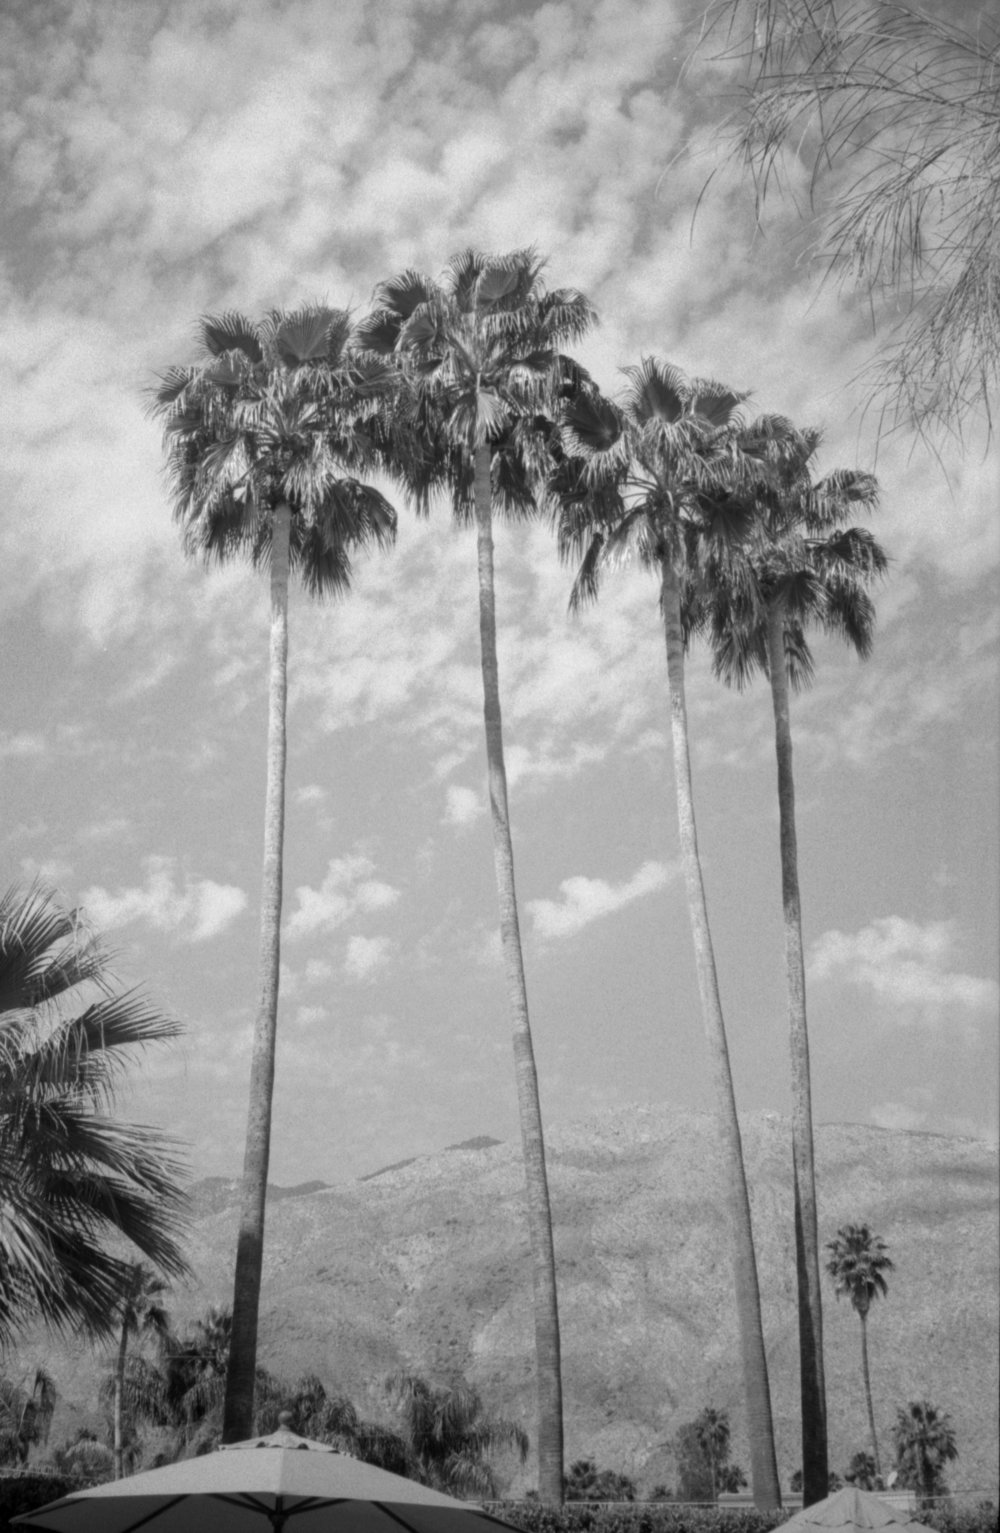 tallpalms.jpg